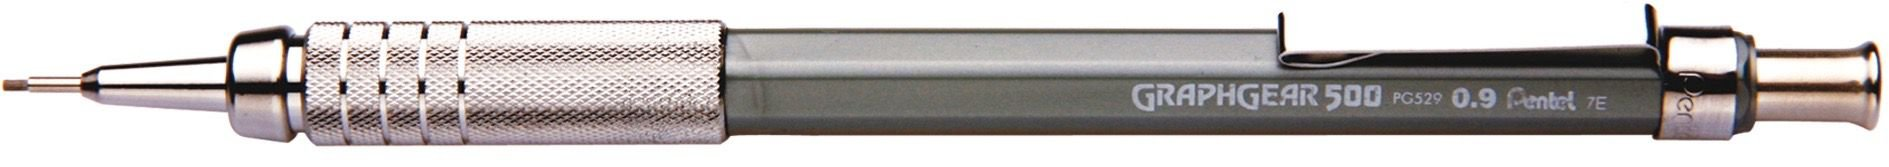 Lapiseira 0.9mm Pentel Graphgear - Prata